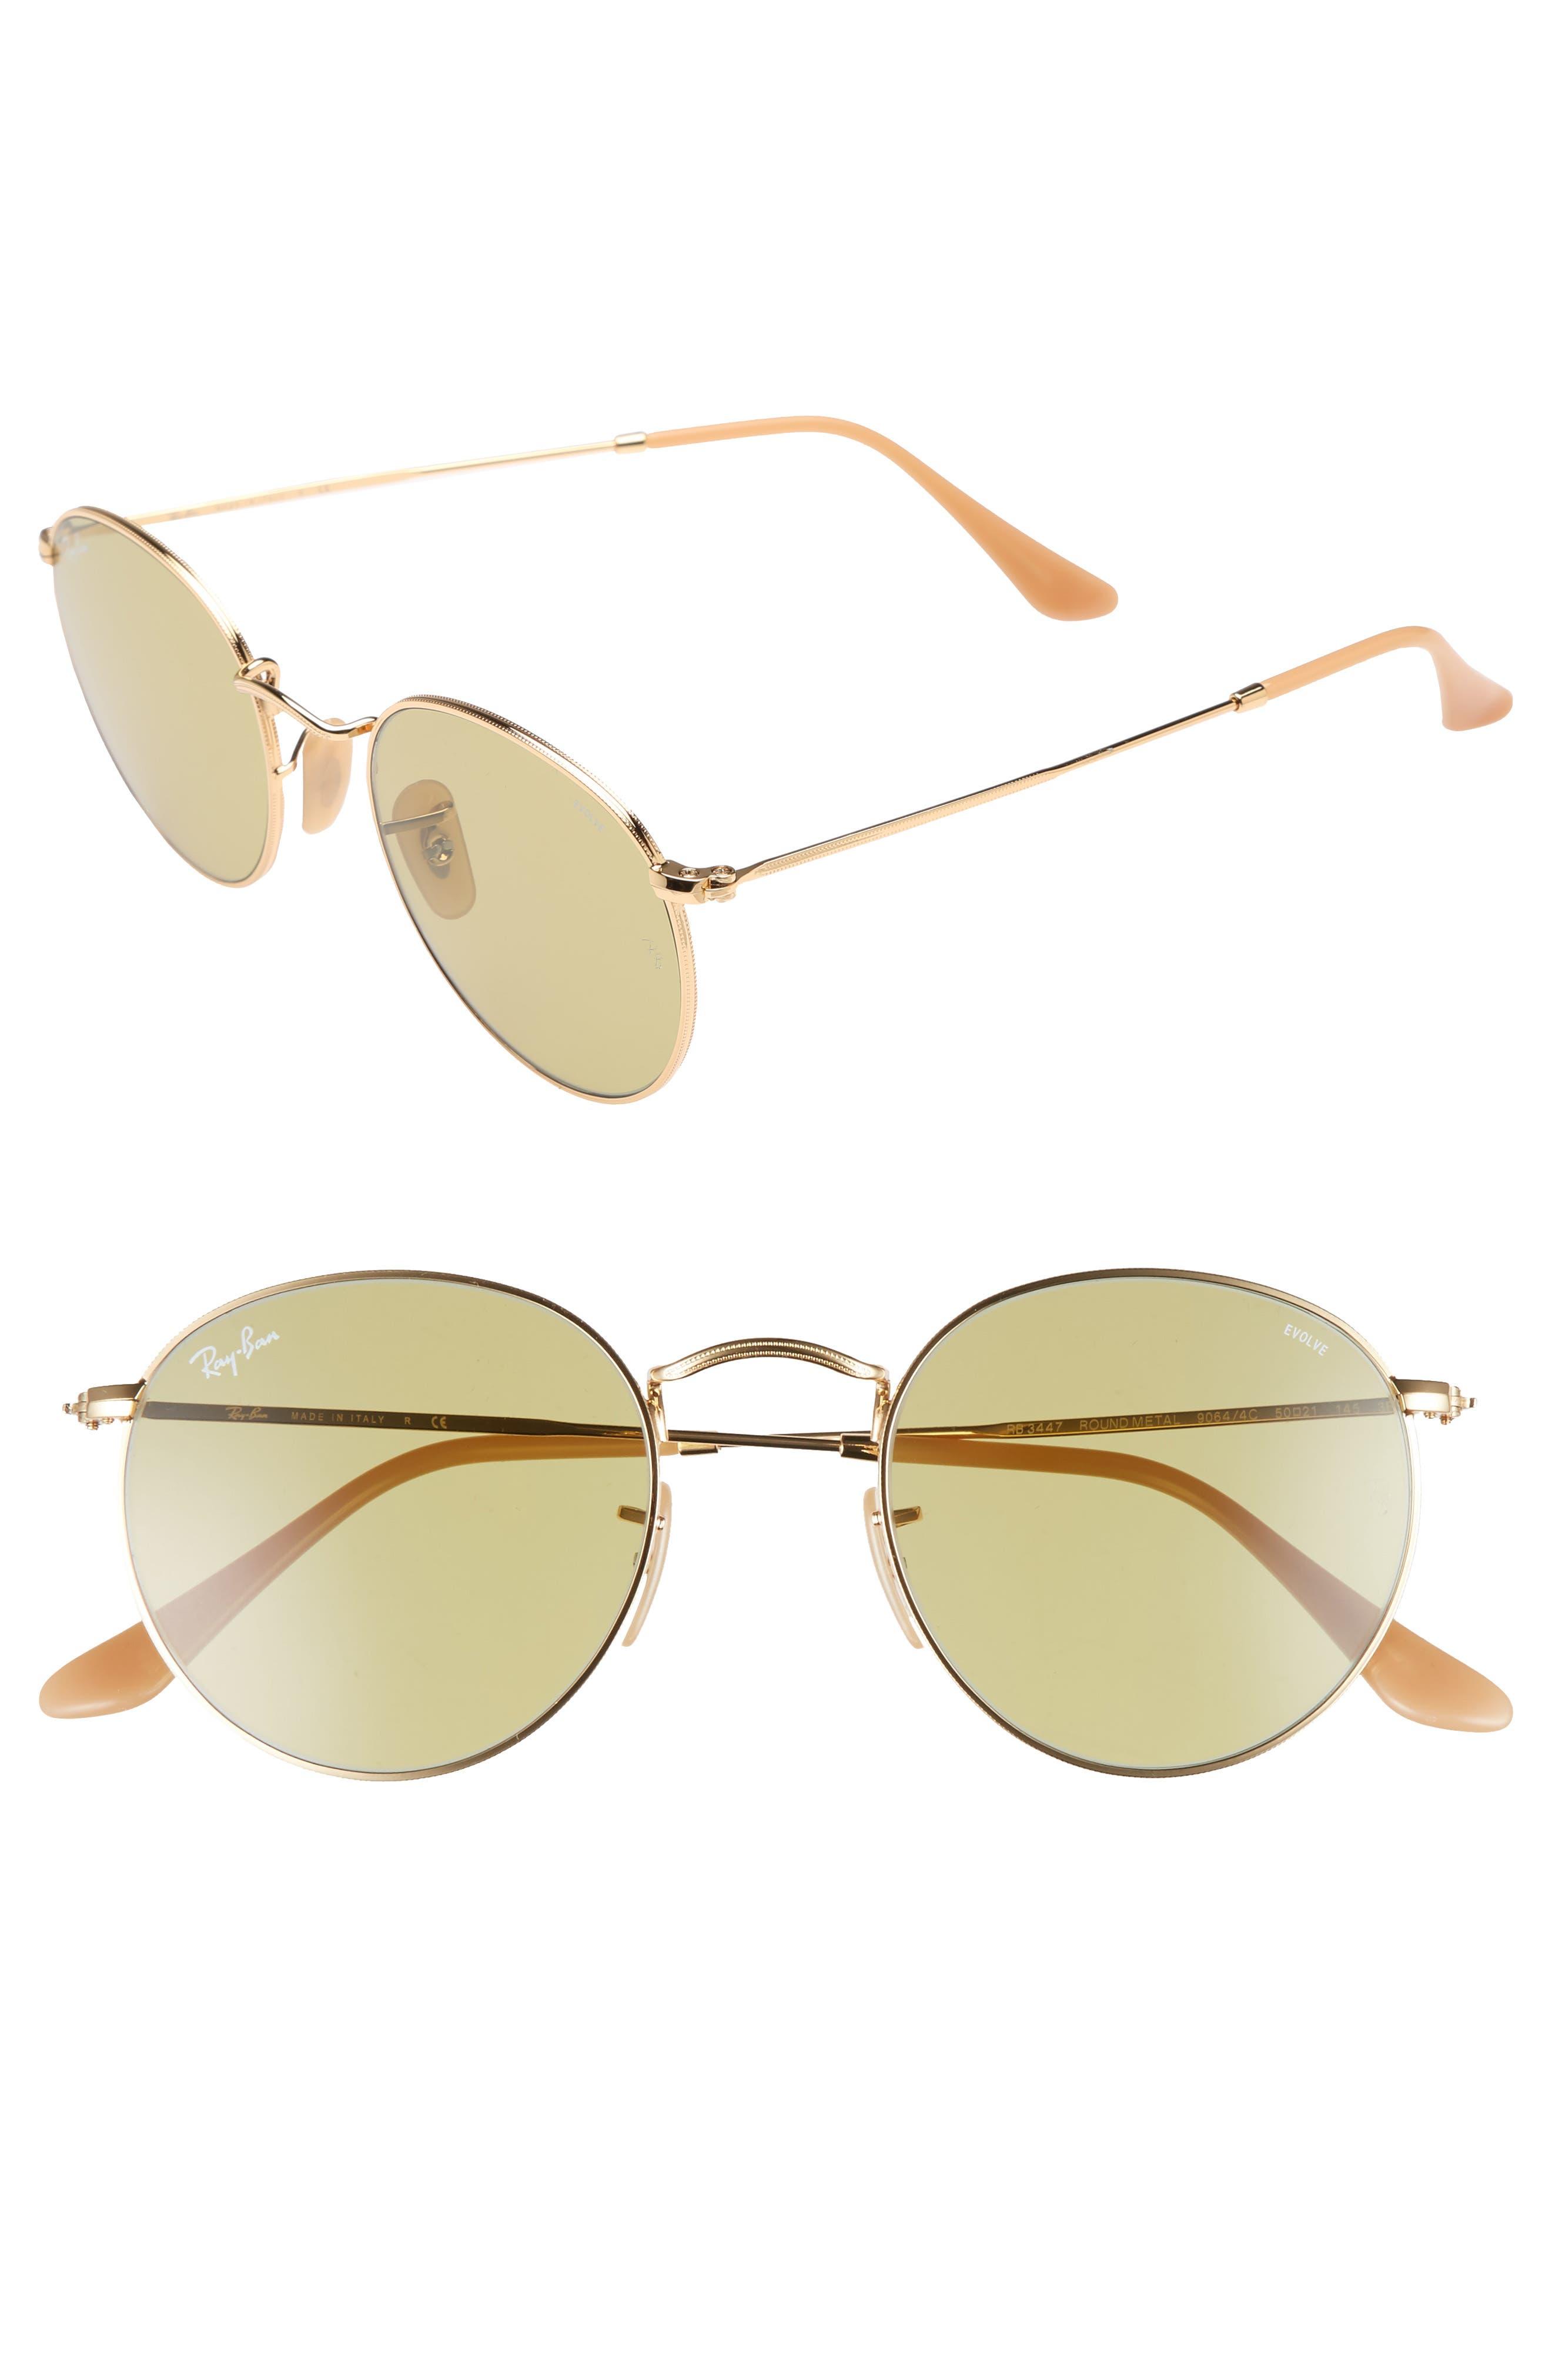 Ray-Ban 50mm Polarized Round Sunglasses